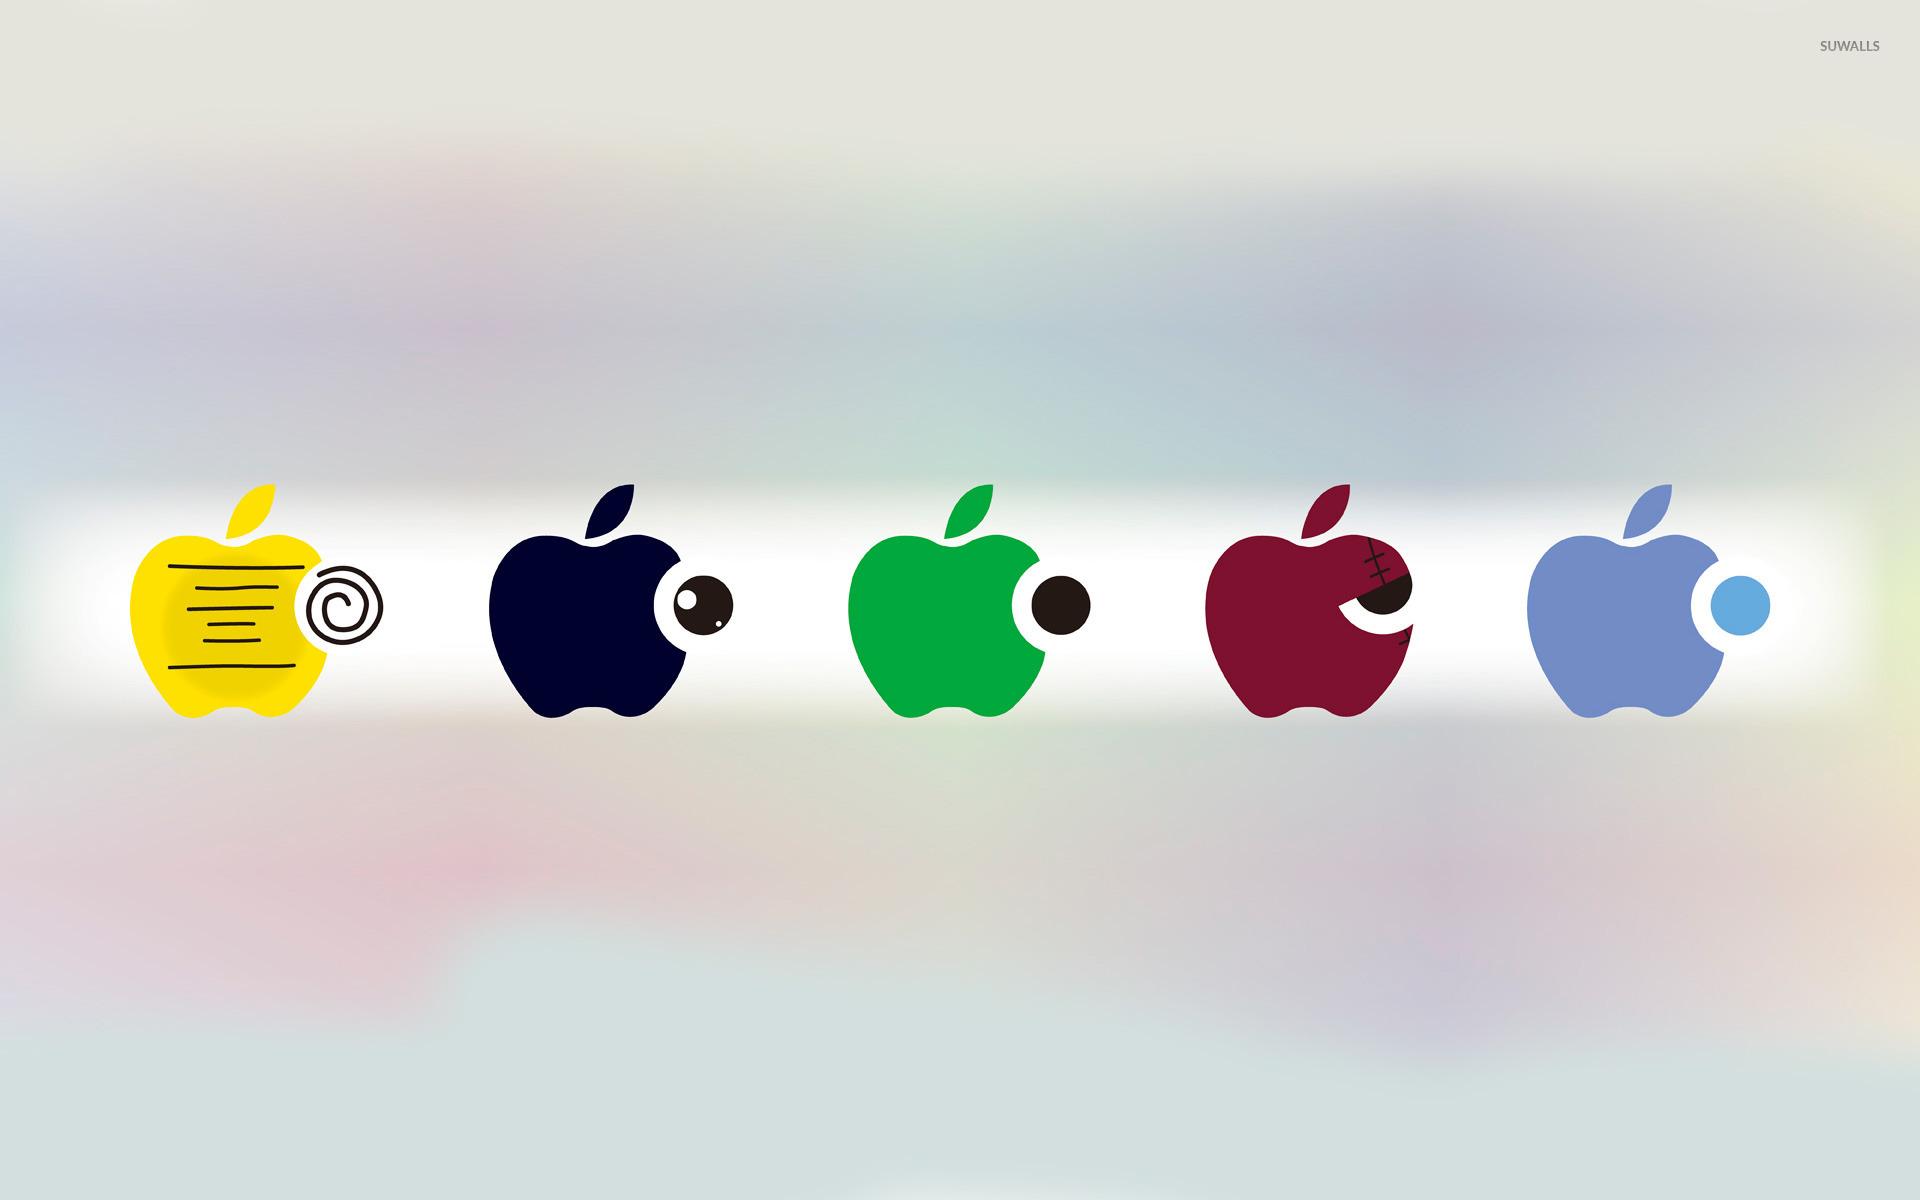 Apples Backdrop Background Apples Wallpaper Apples Stock Vector